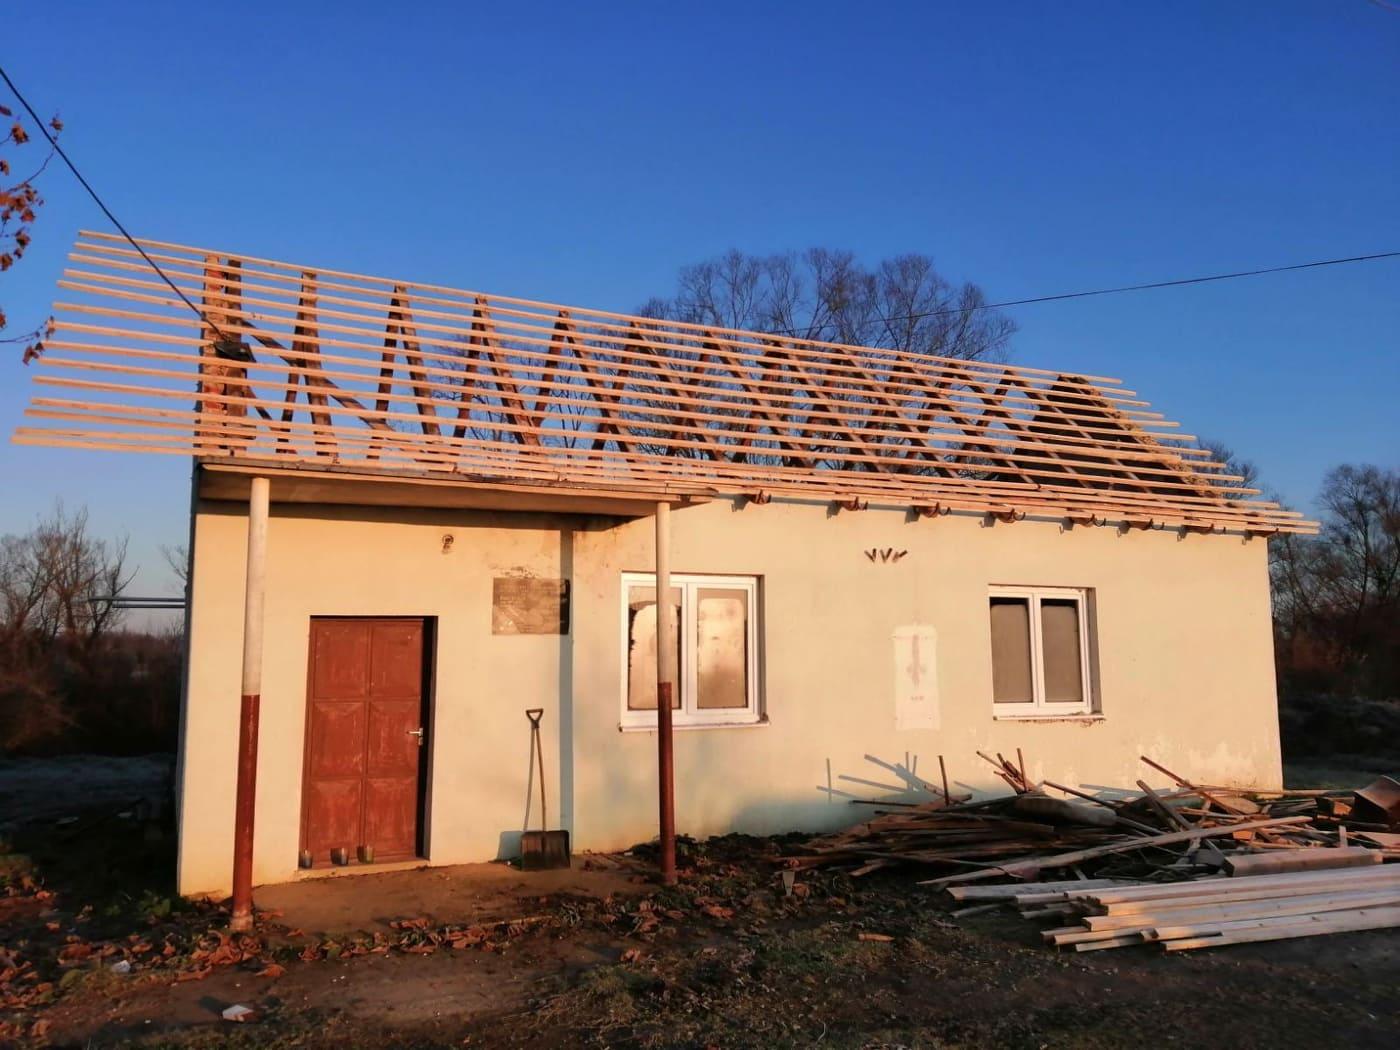 Grad Čazma obnavlja društvene i vatrogasne domove